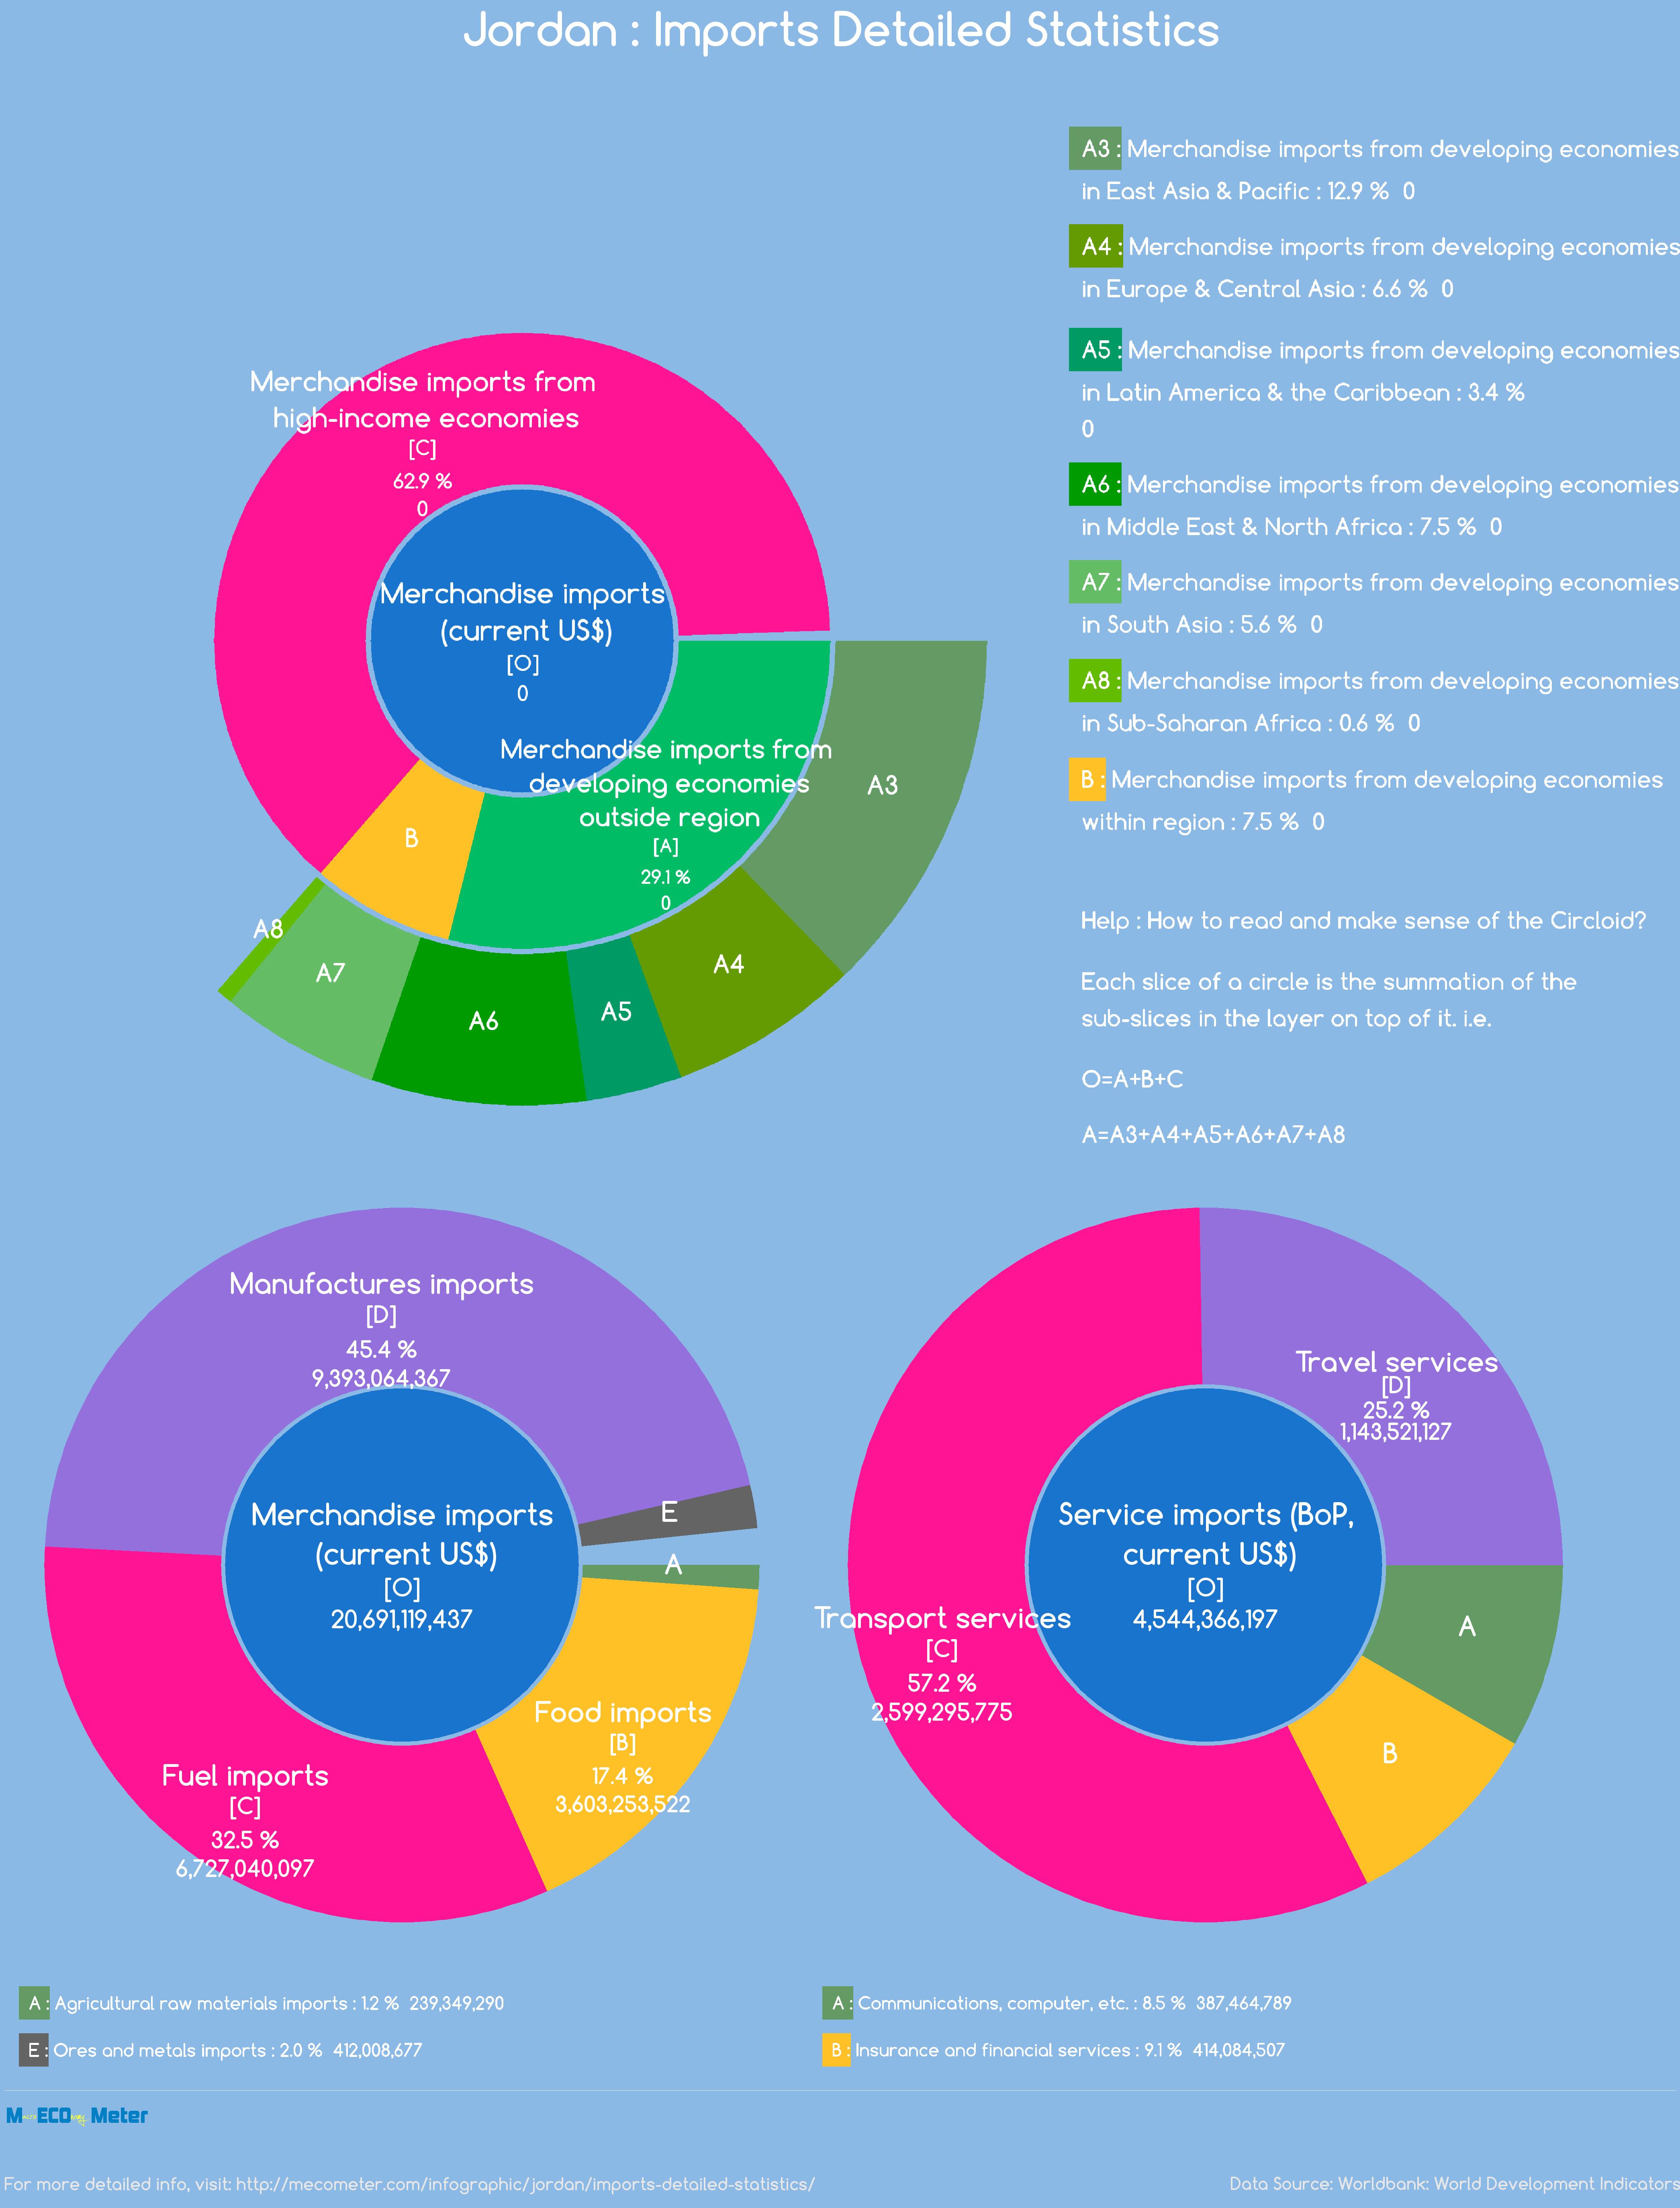 Jordan : Imports Detailed Statistics